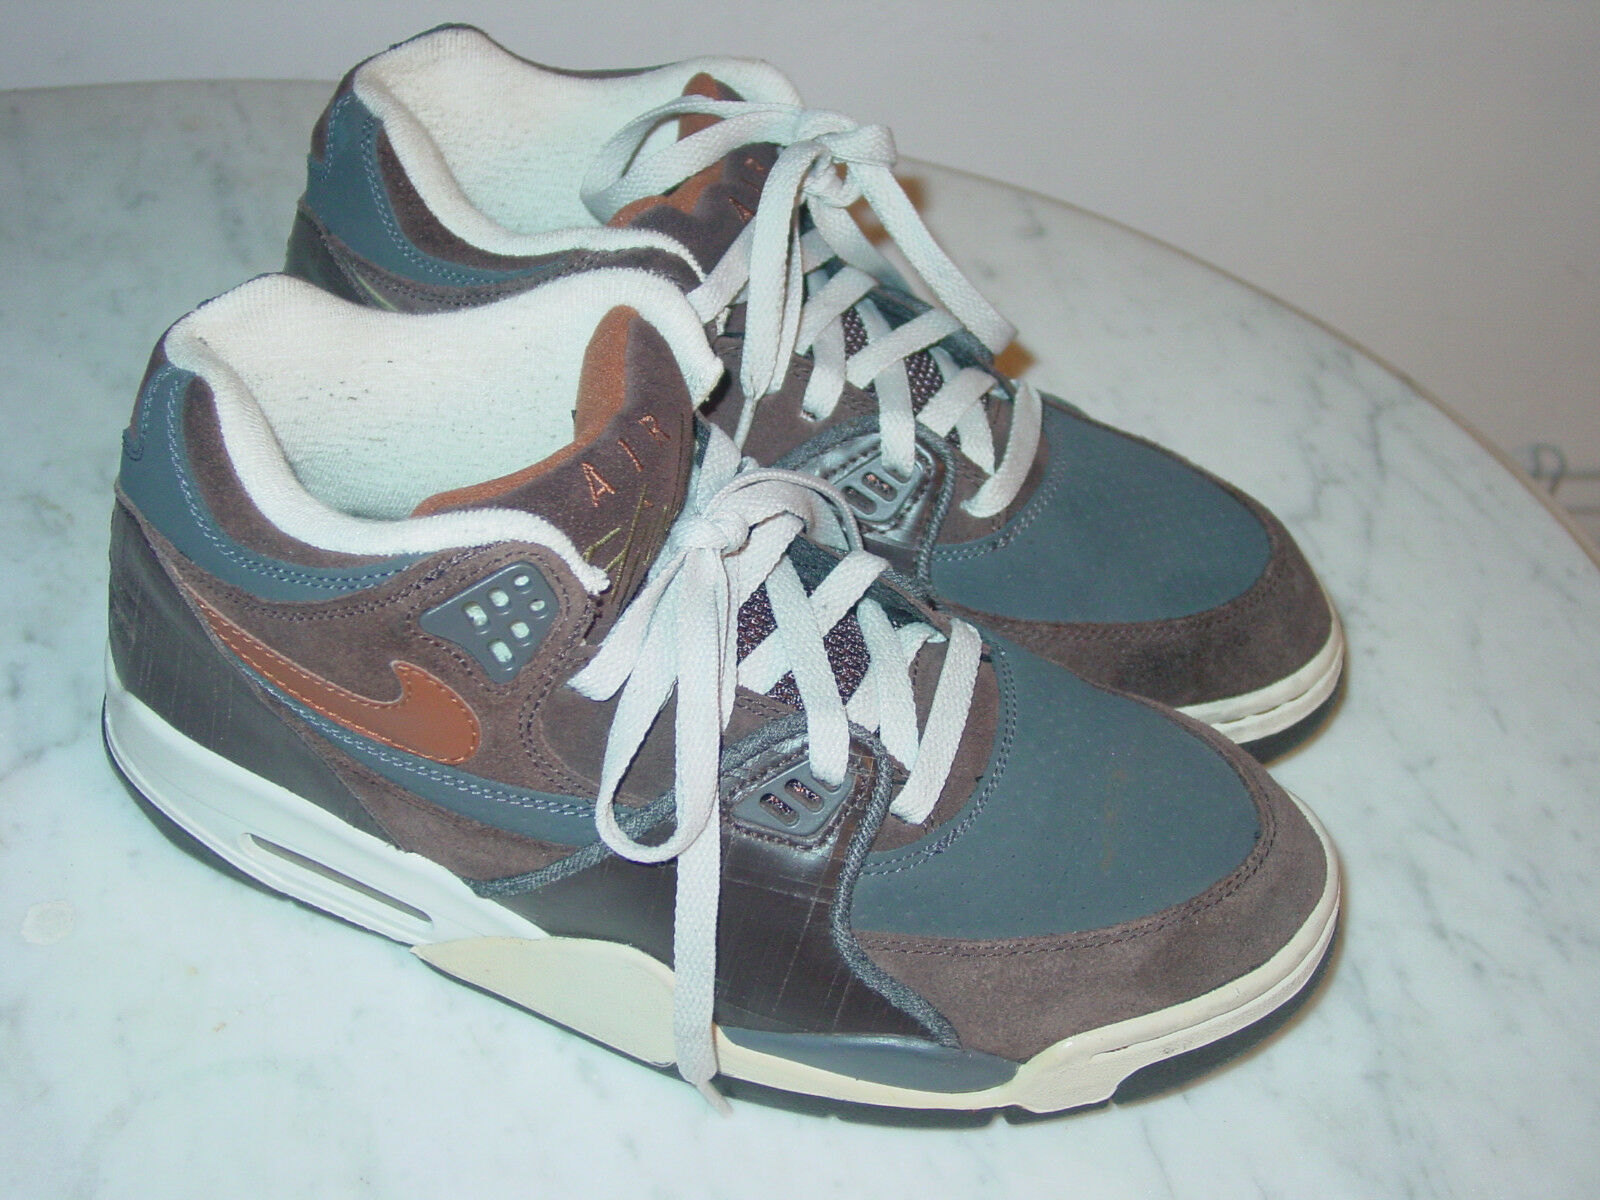 superior quality fafb3 ce8d6 2007 Nike Air Flight 89 Dark Cinder Cognac Cognac Cognac Midnight Fog  Basketball shoes Size 10